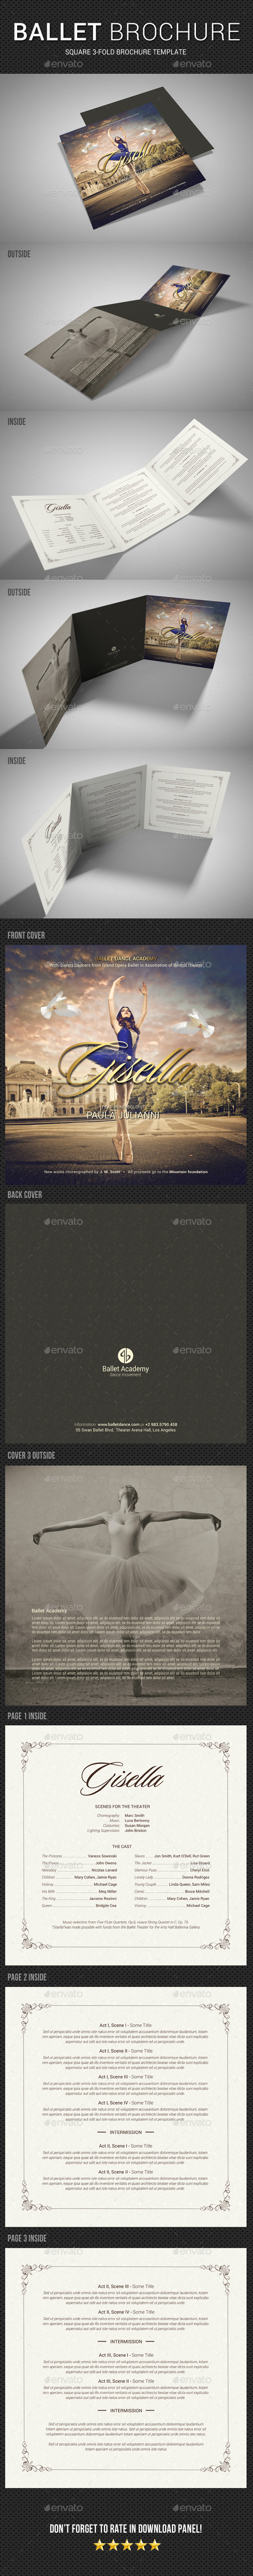 Ballet Program Square Tri-Fold Brochure - Brochures Print Templates